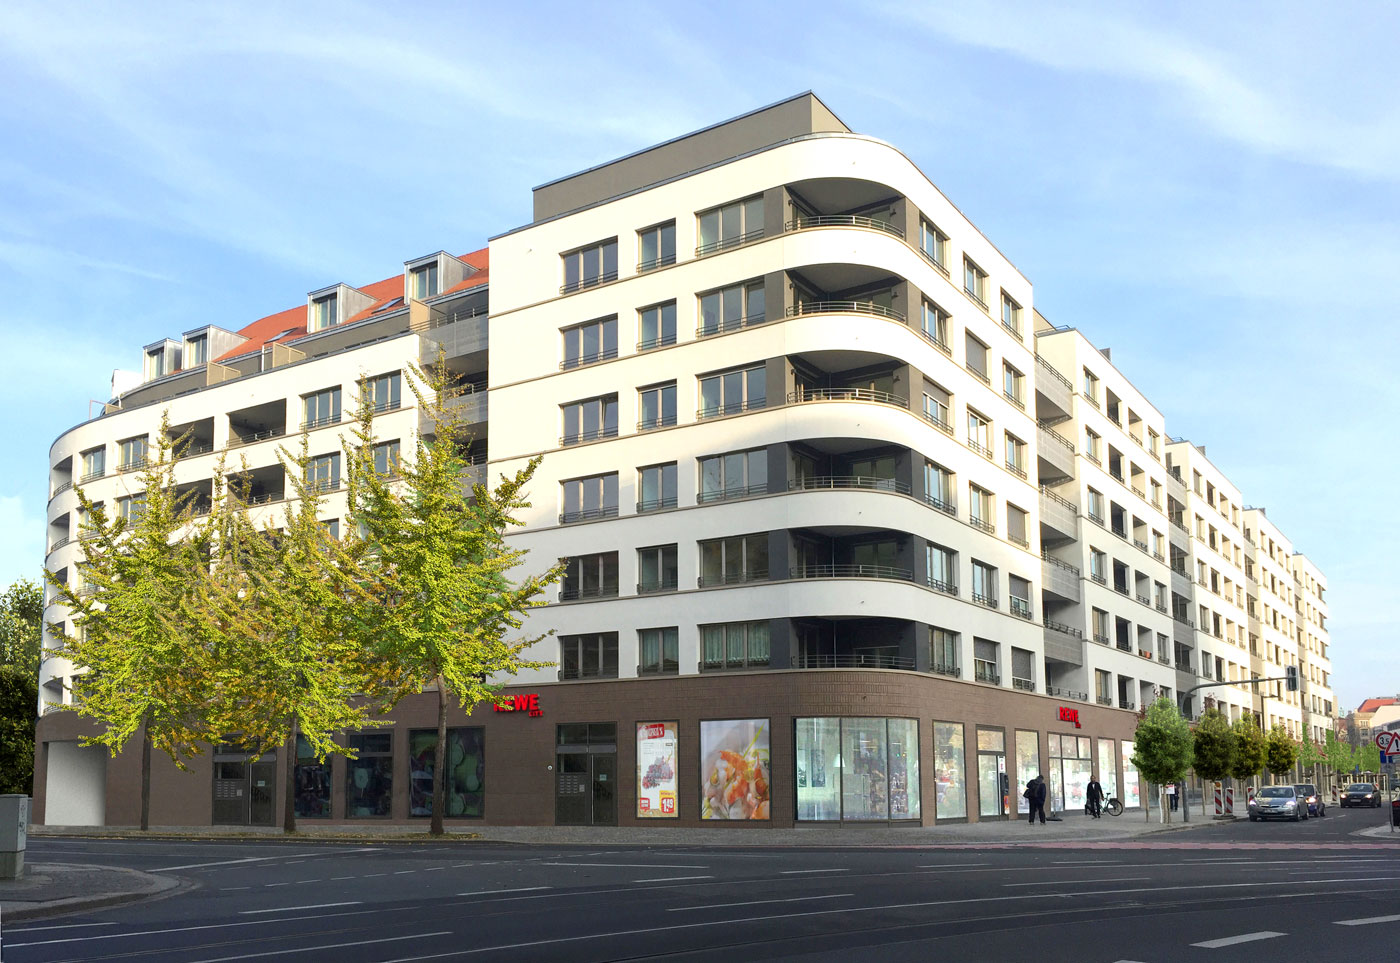 Baumanagement Haus am Schauspielgarten - hpm Henkel Projektmanagement